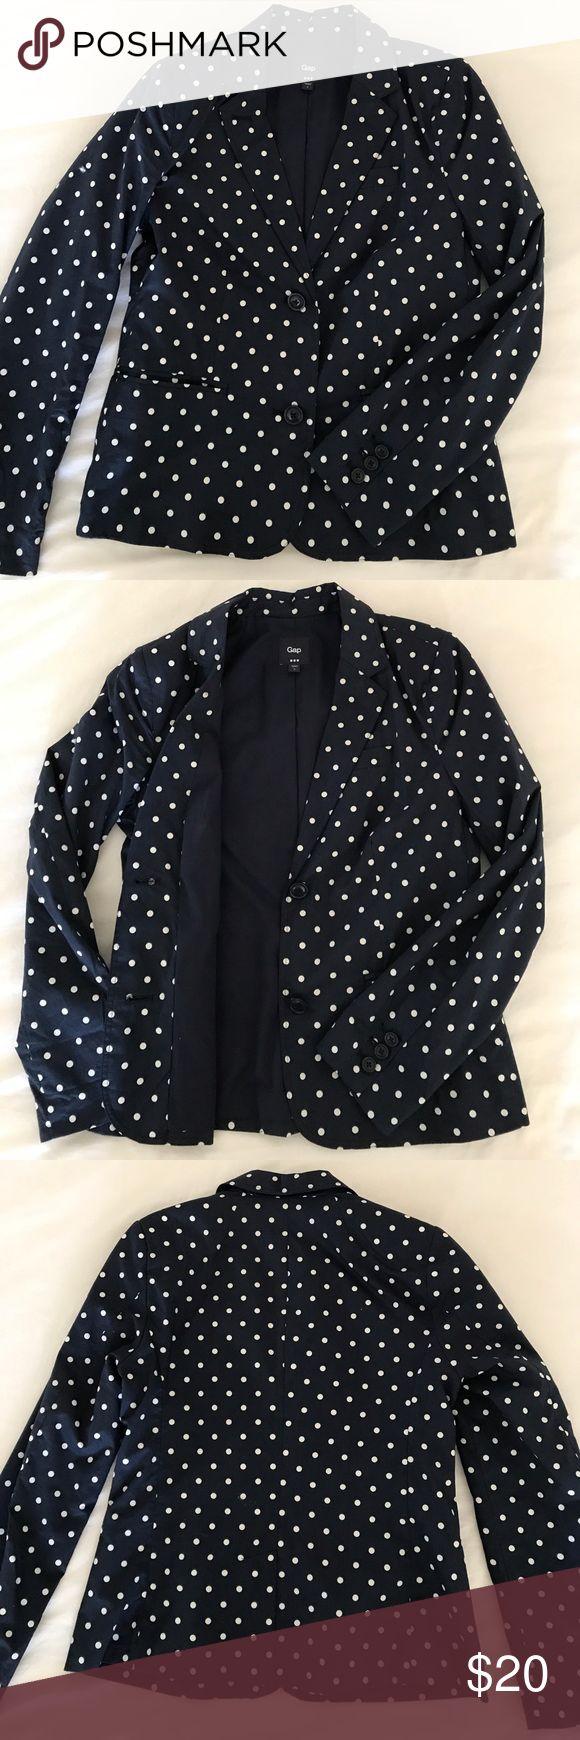 Gap polka dot blazer Navy two button polka dot blazer with two slit pockets on the front GAP Jackets & Coats Blazers